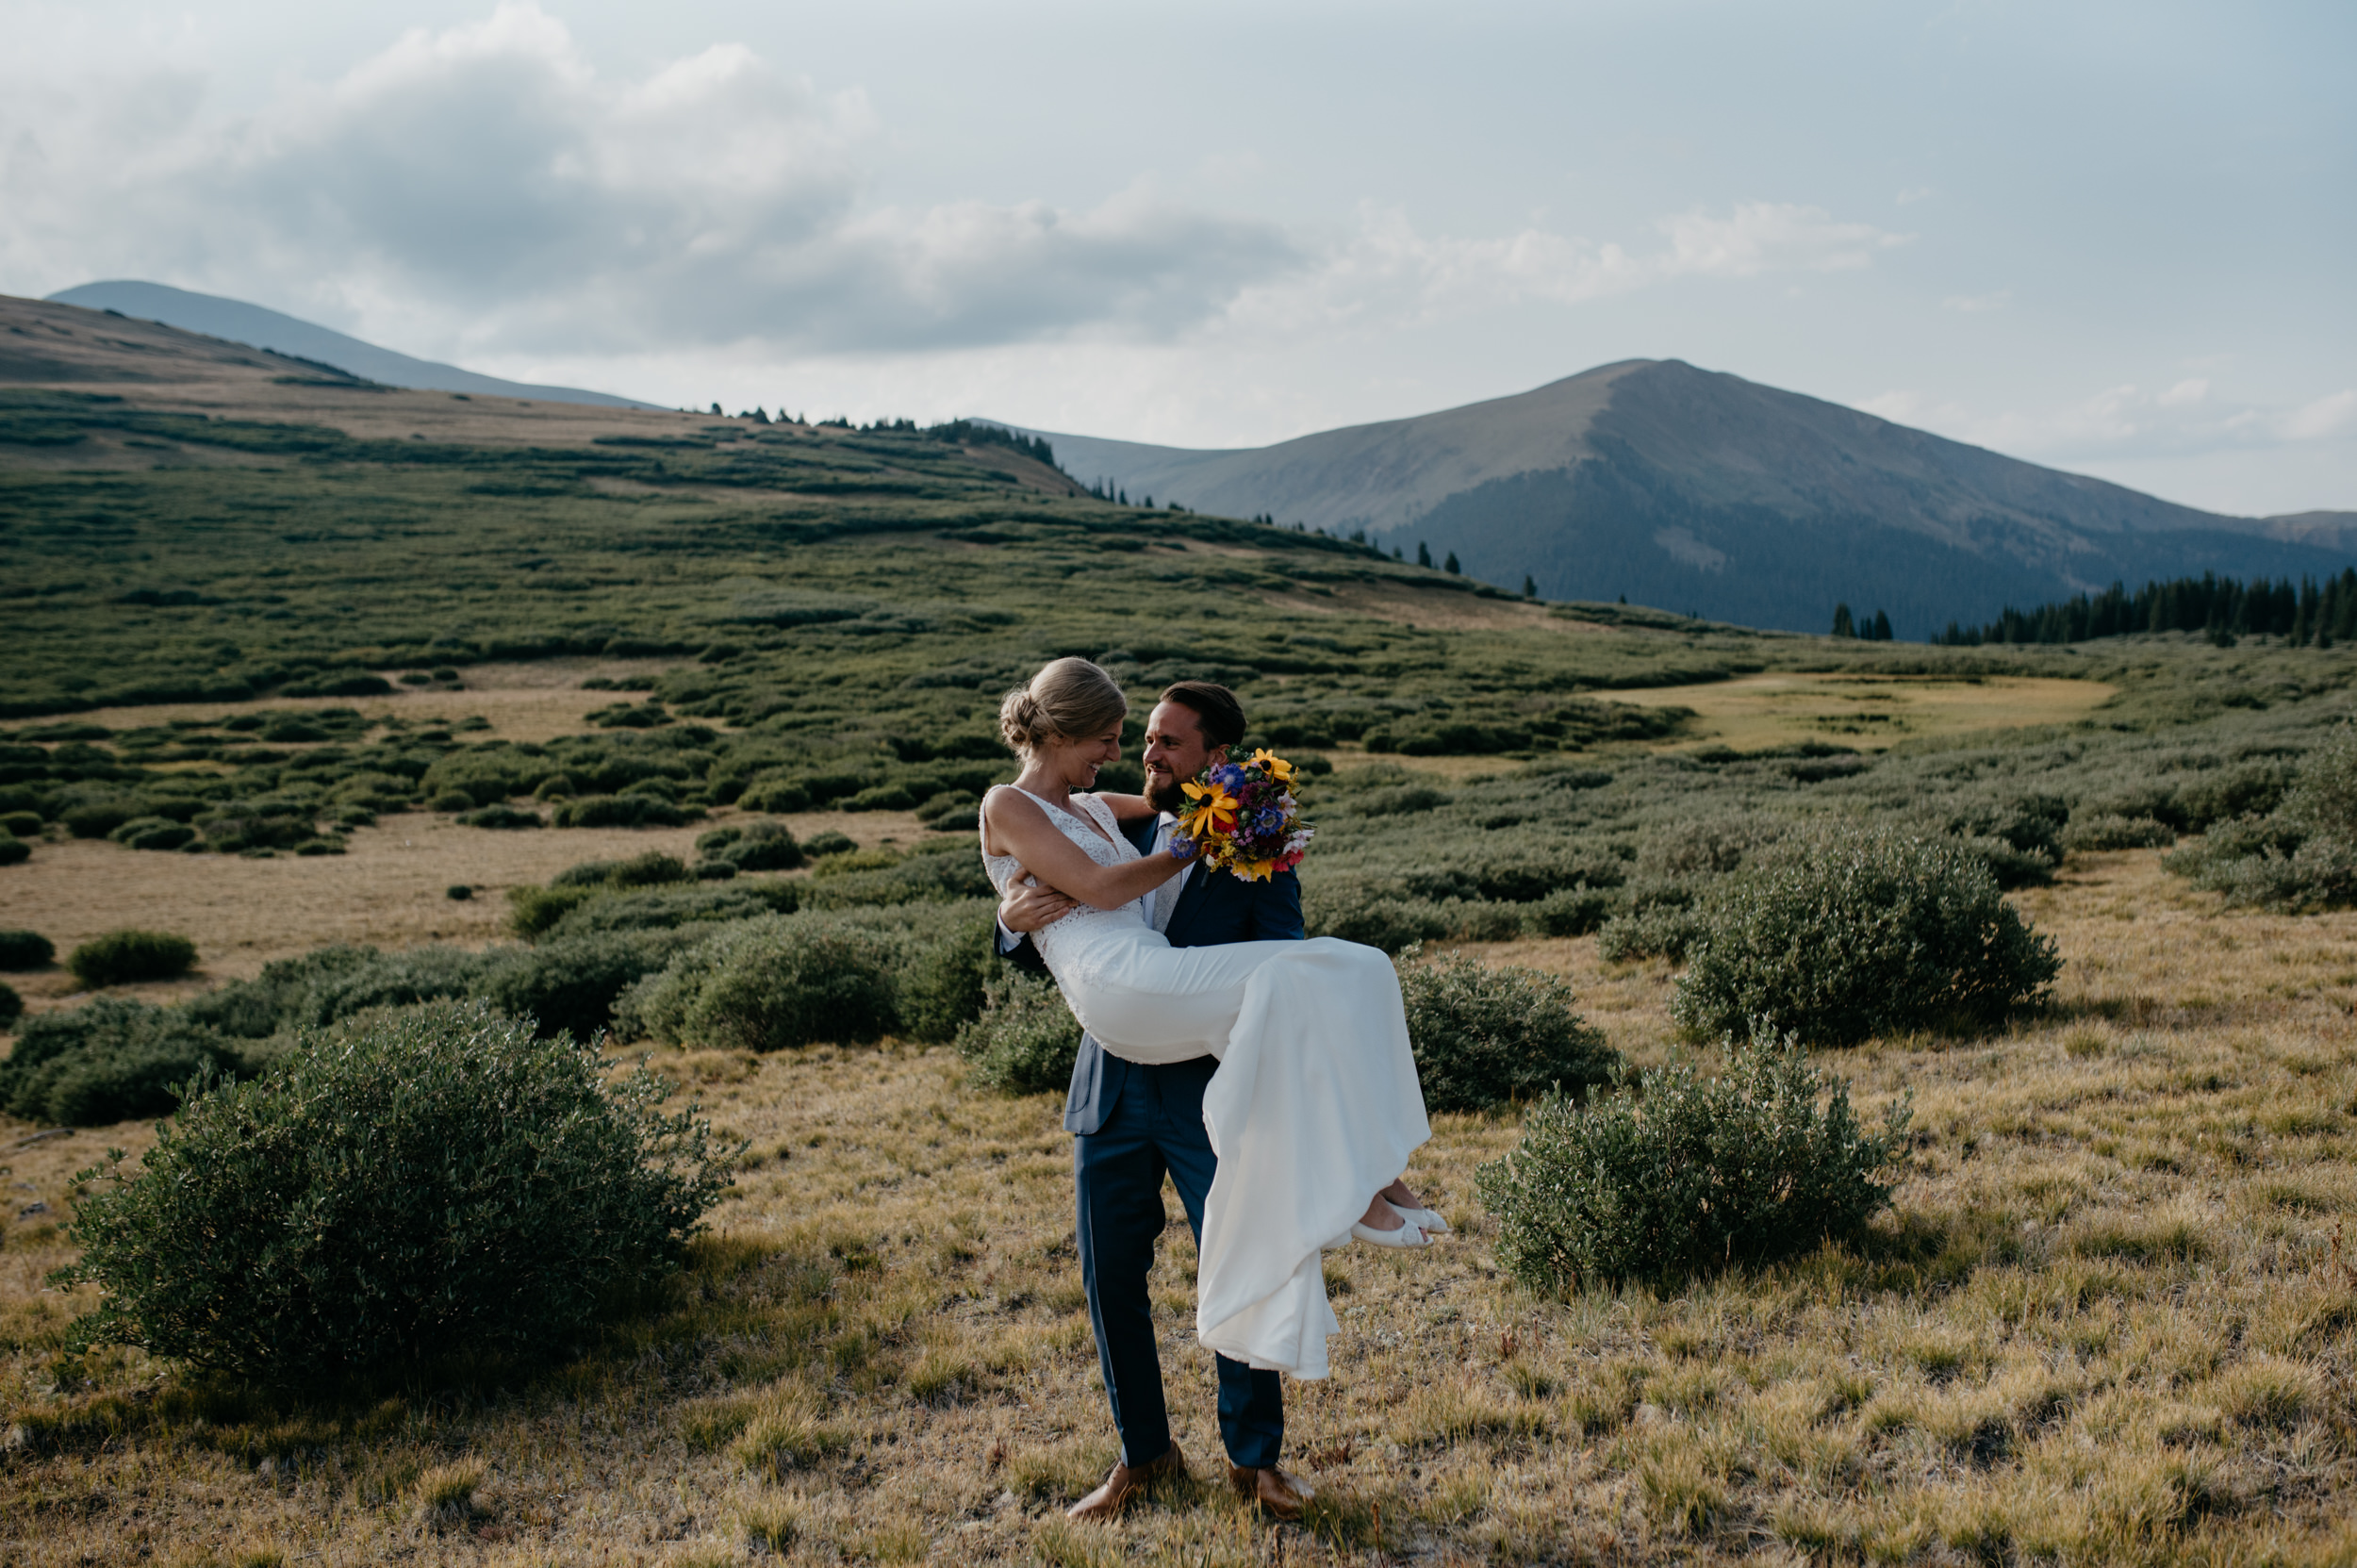 Denver, Colorado based elopement and wedding photographer.